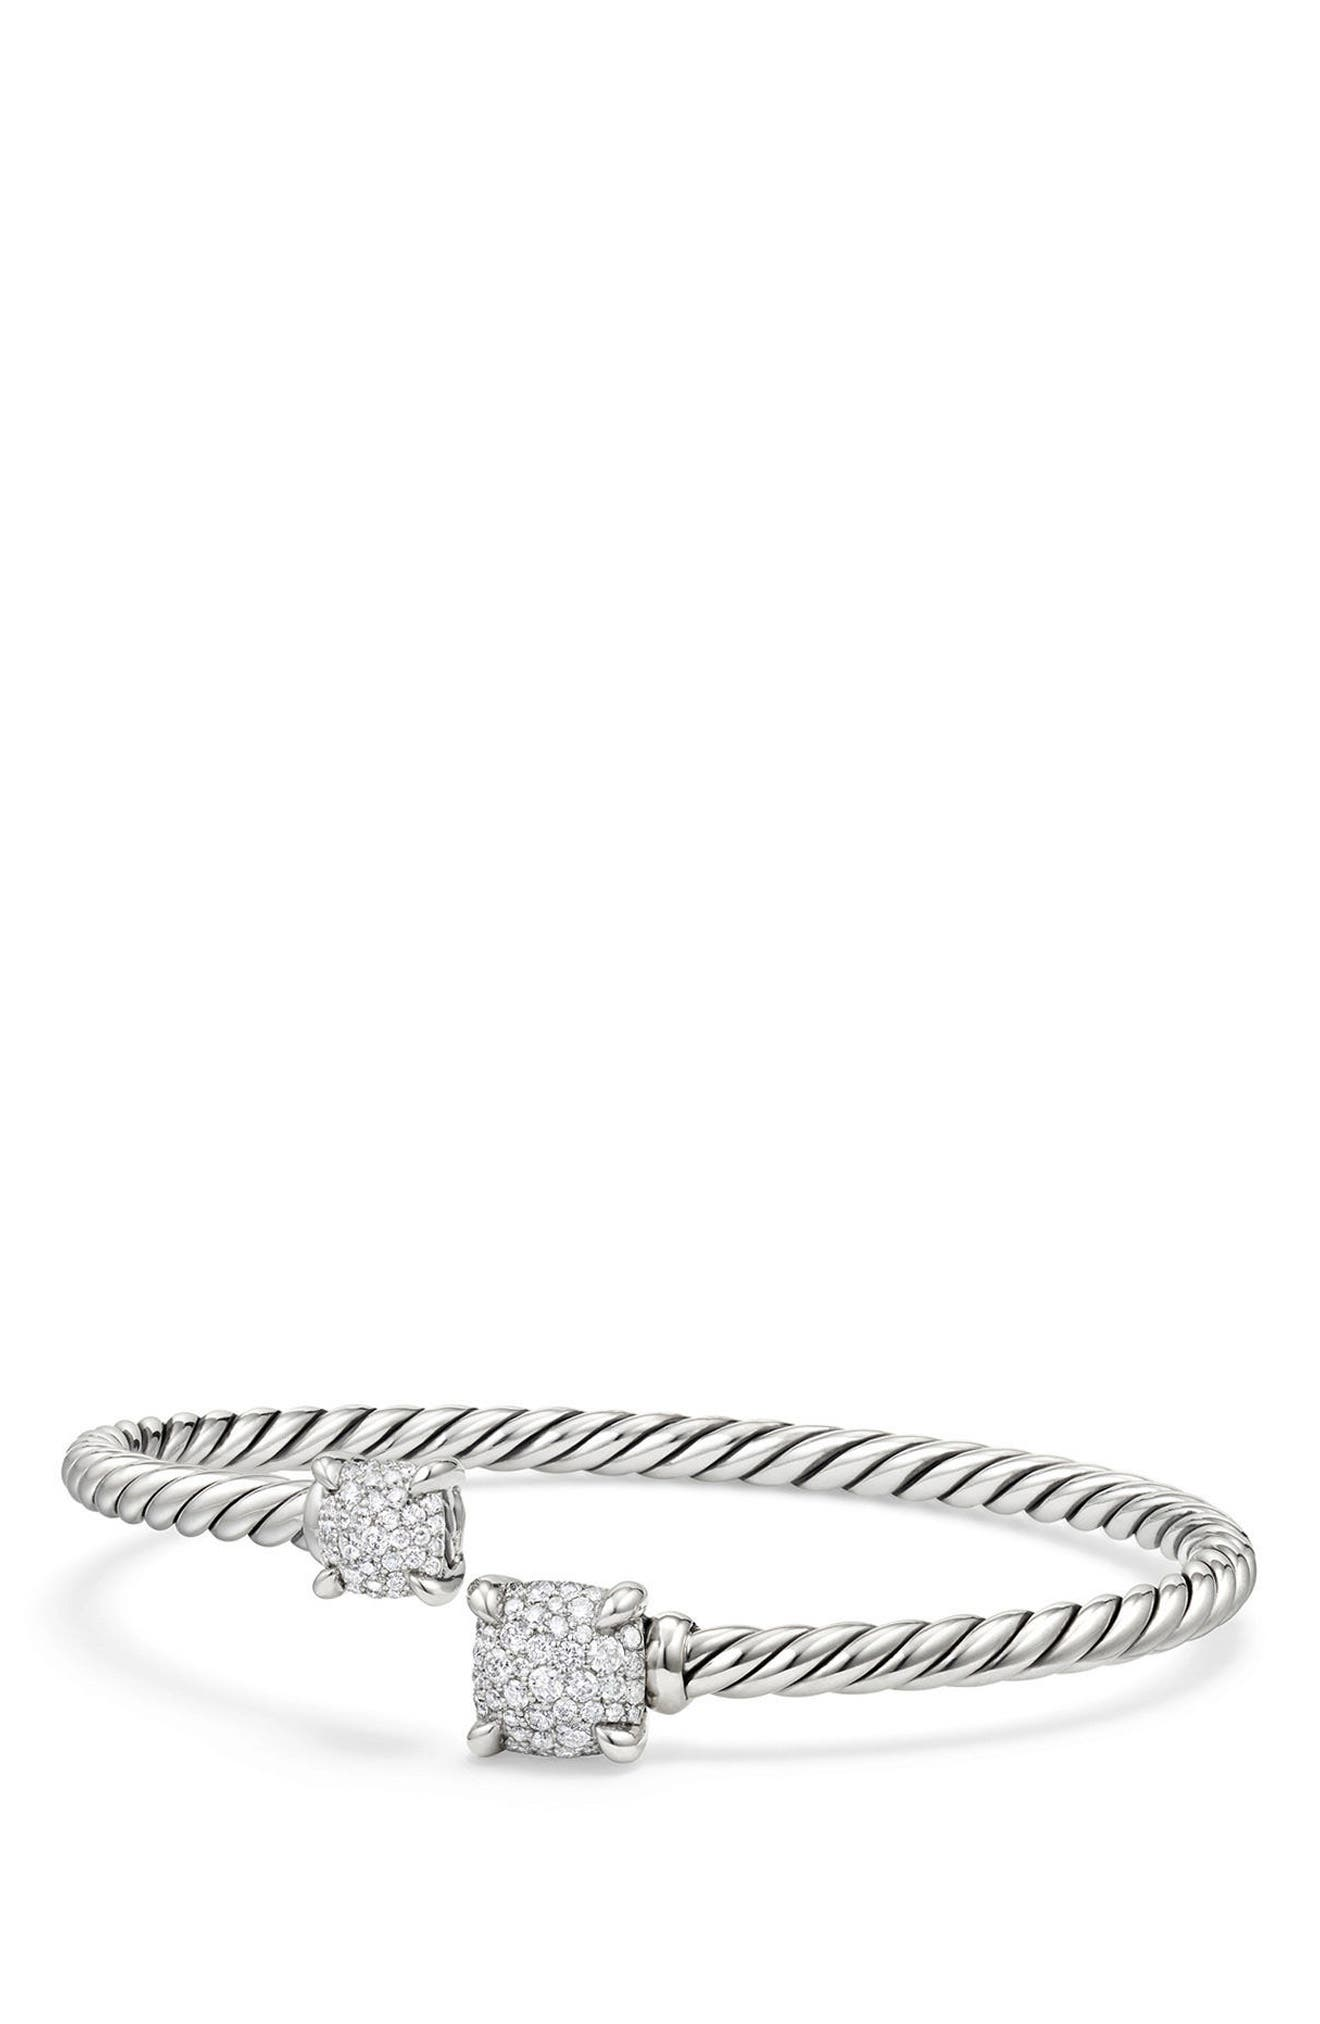 Châtelaine Bypass Bracelet with Diamonds,                             Main thumbnail 1, color,                             Silver